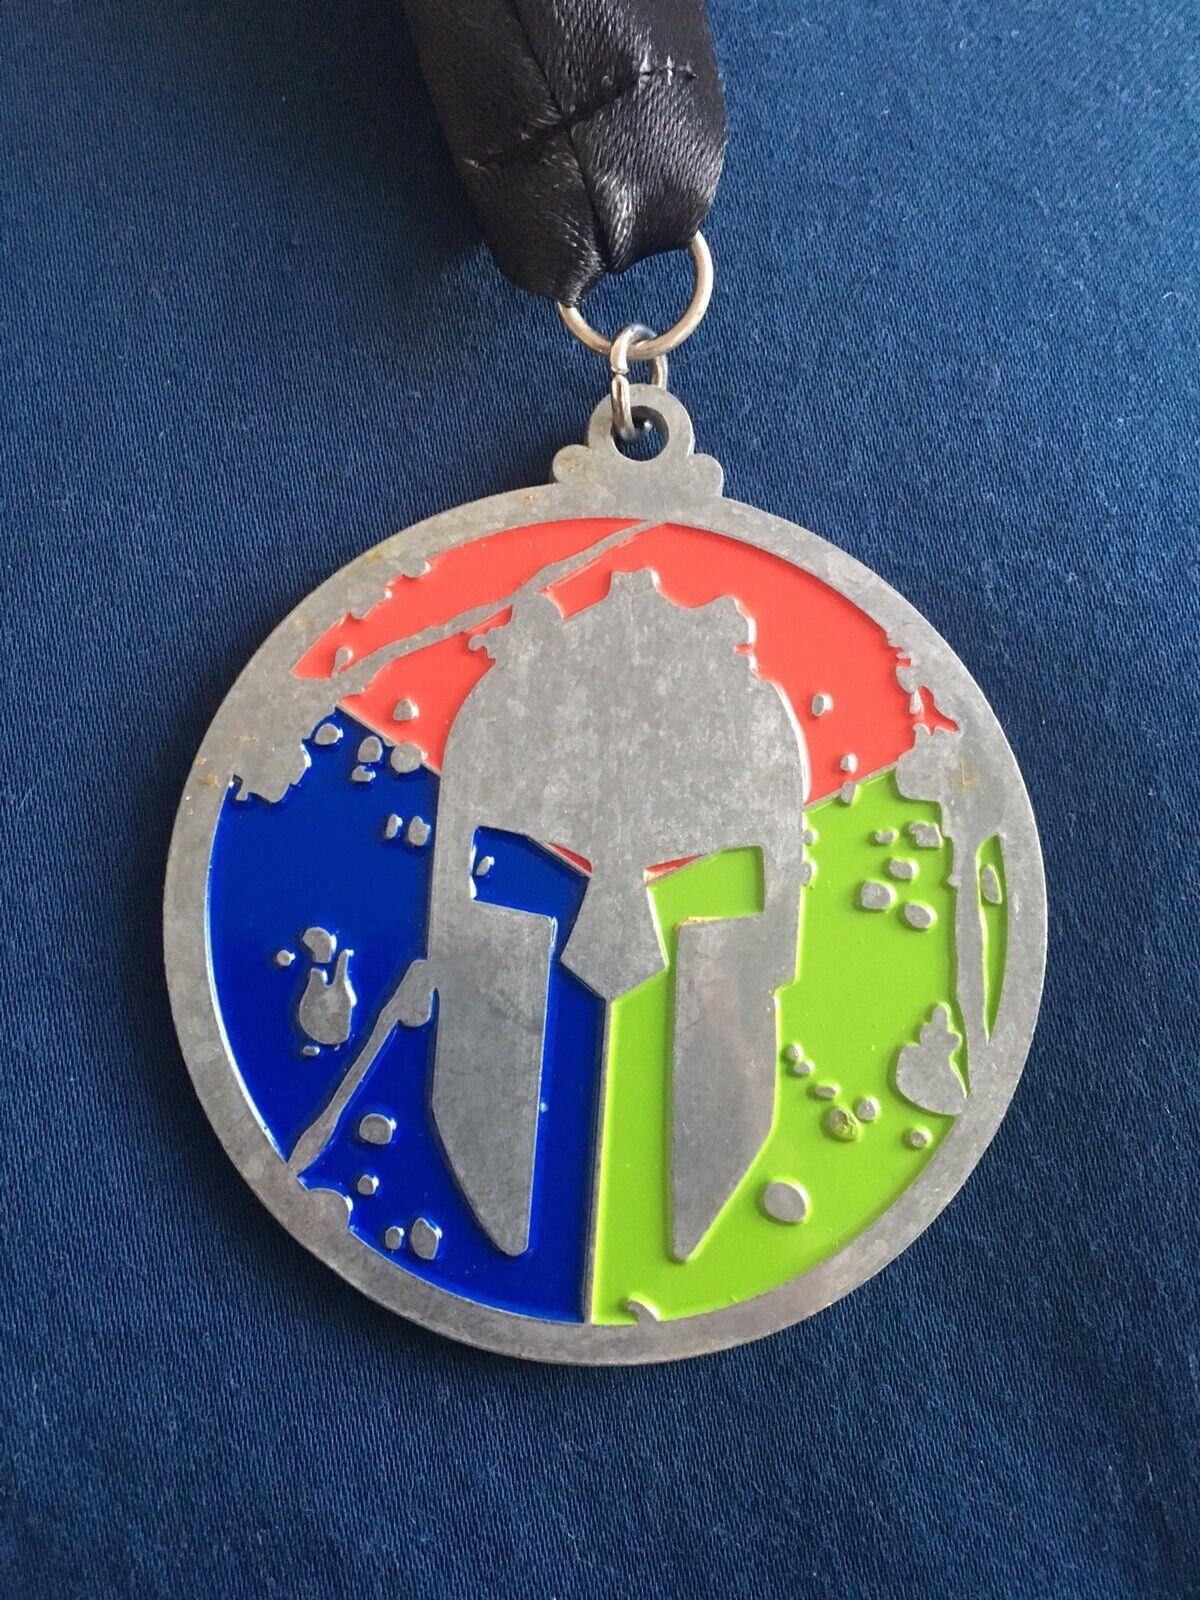 Spartan Race 2013 Original Trifecta Medal With Sprint, Super, Beast Medals